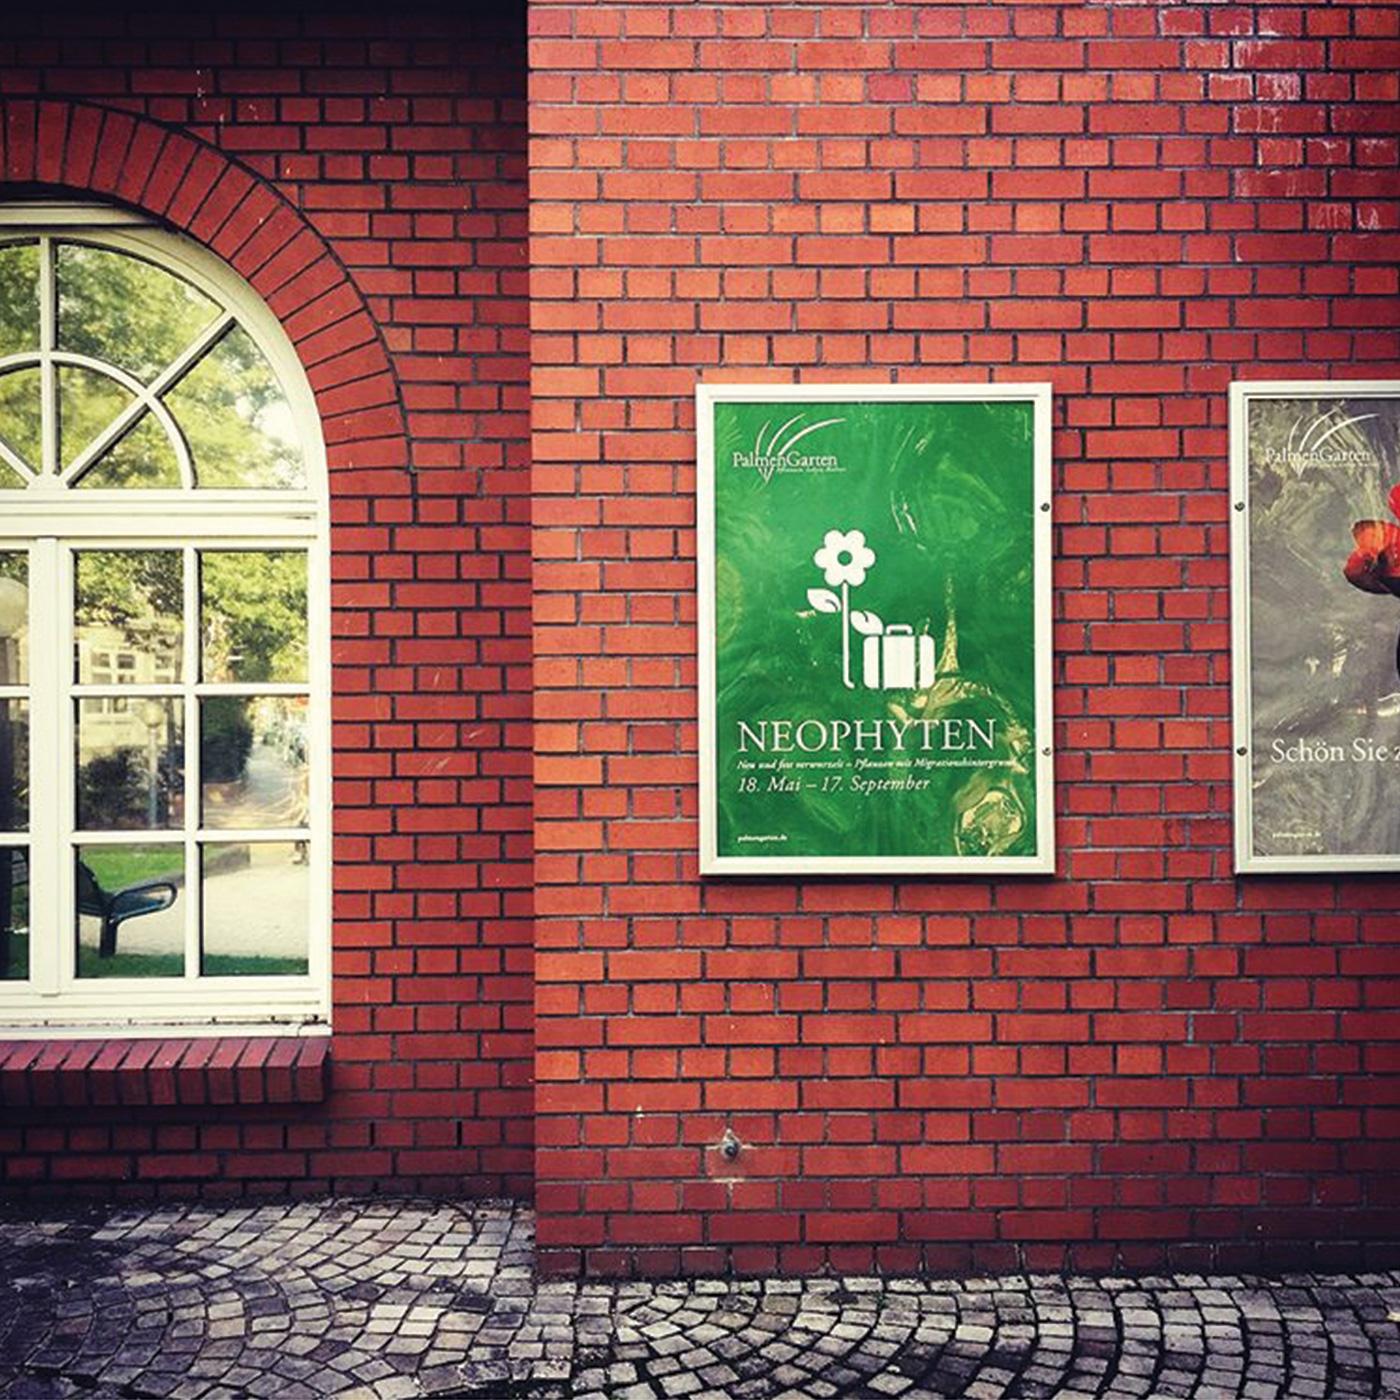 pictograms_andre_levy_zhion_vector_campaign_palmengarten_frankfurt_christian_schoen_neophyten_minimal_icon_poster_2.jpg